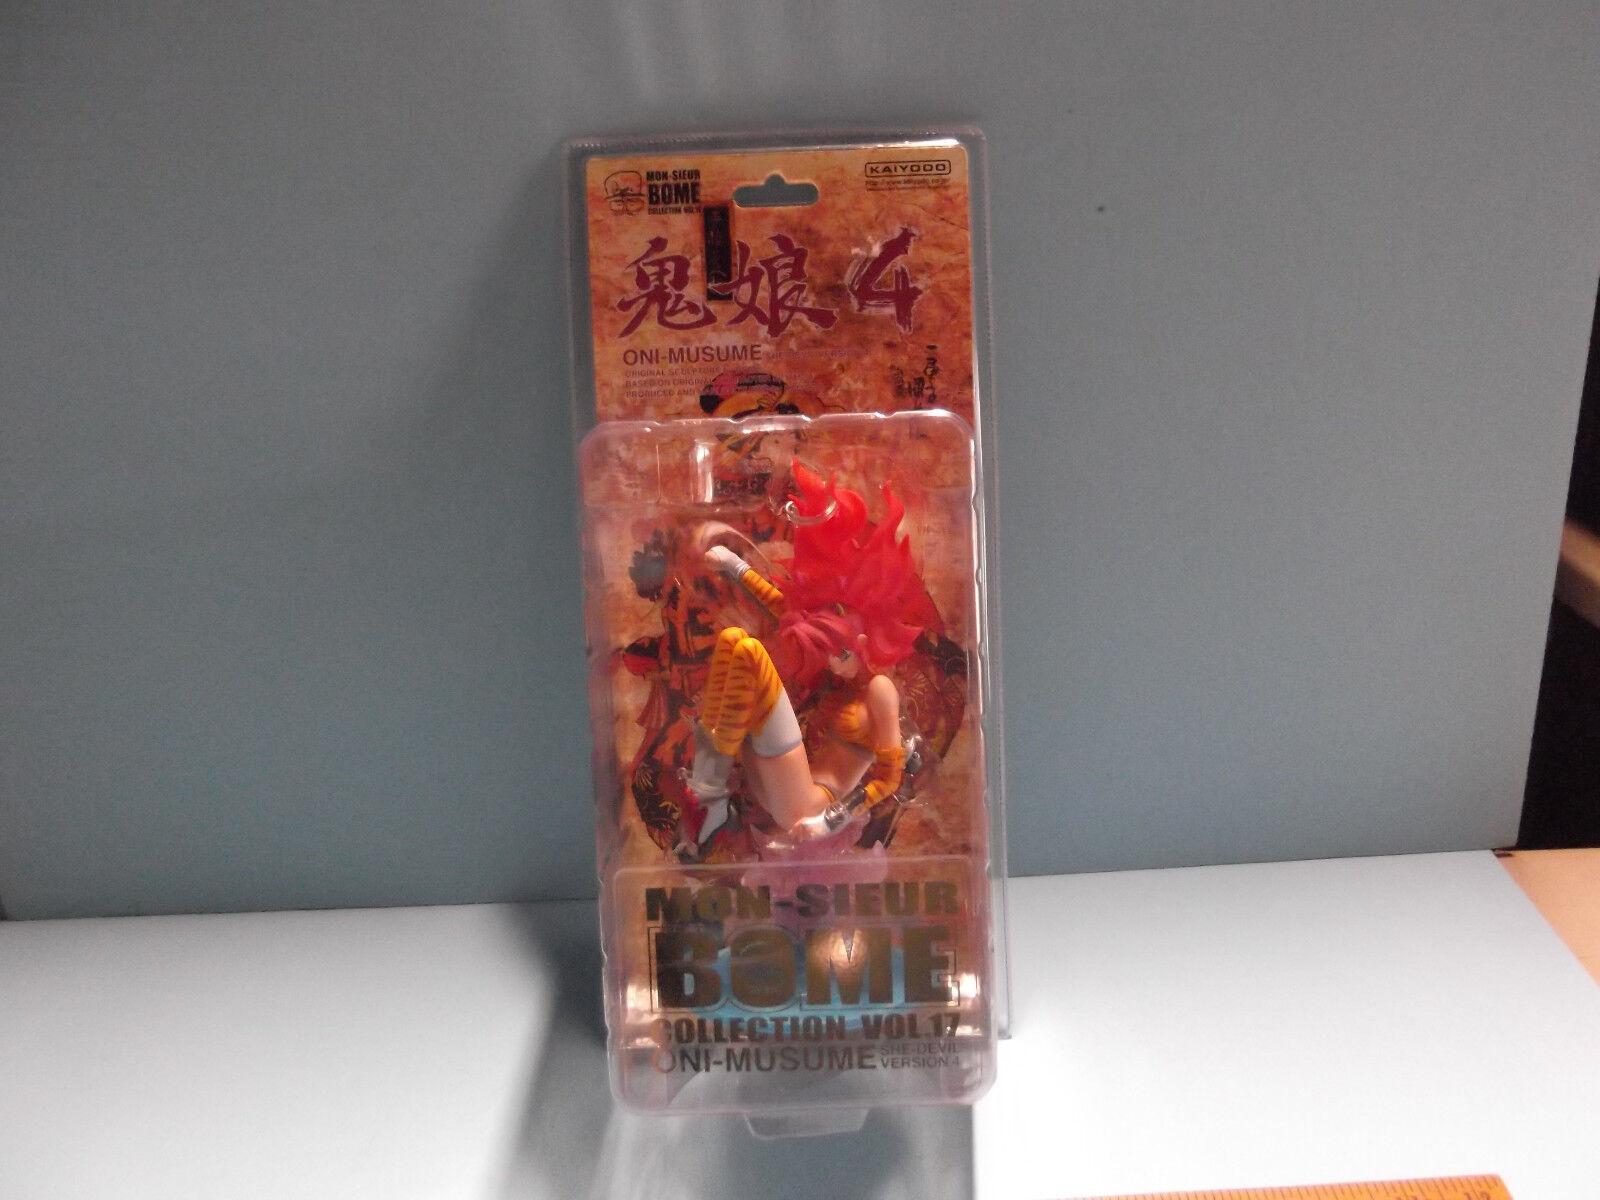 Mon-Sieur BOME Collection VOL.17 ONI-MUSUME 8 in SHE DEVIL Version 4 Kaiyodo